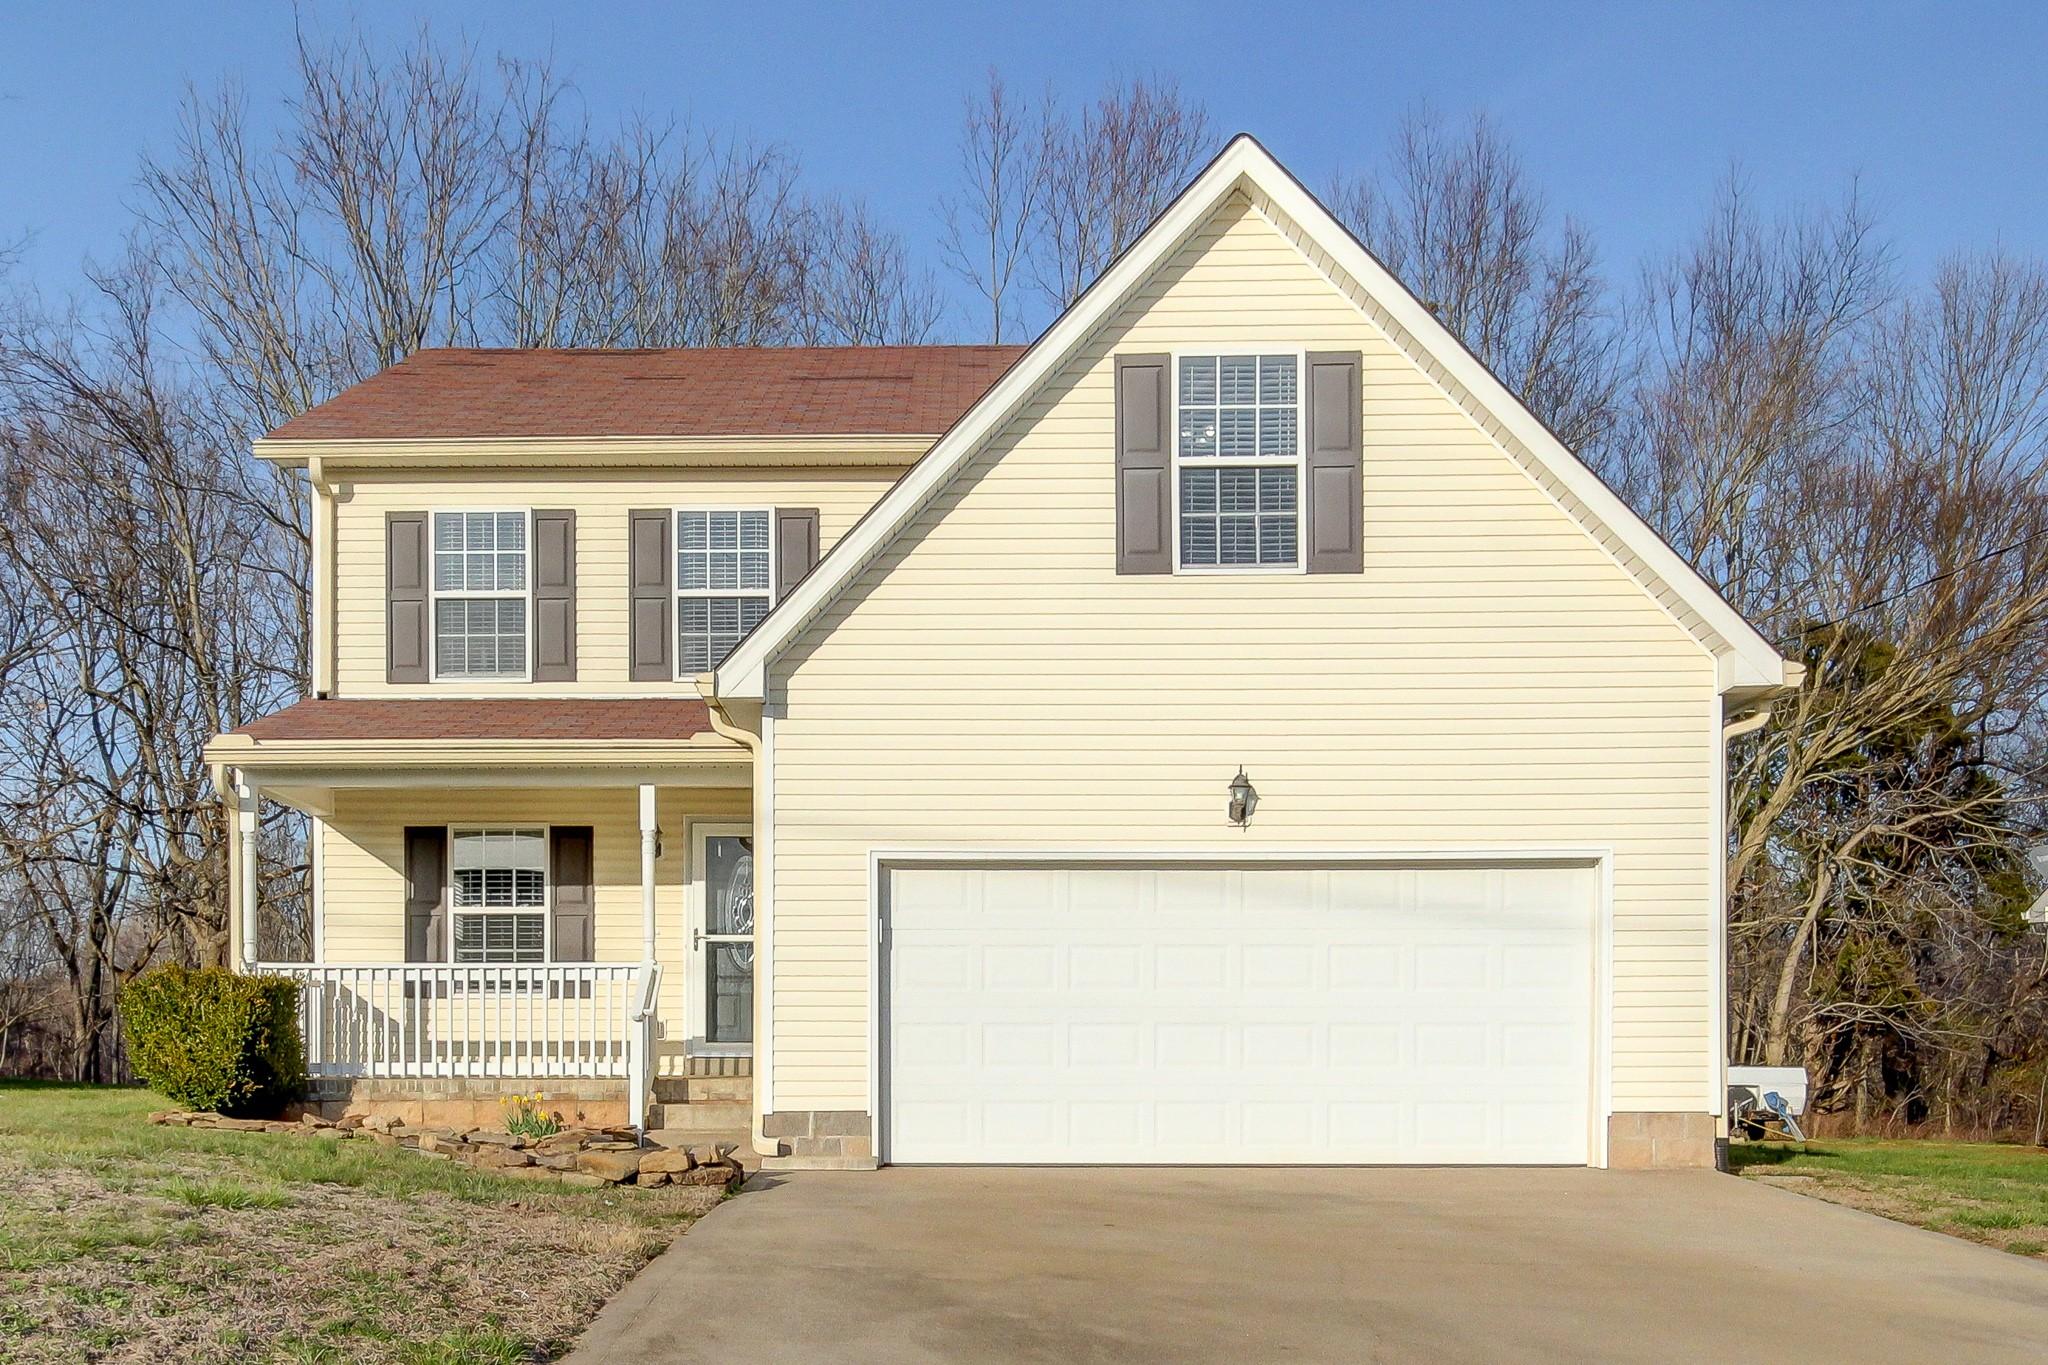 302 Grant Ave, Oak Grove, KY 42262 - Oak Grove, KY real estate listing